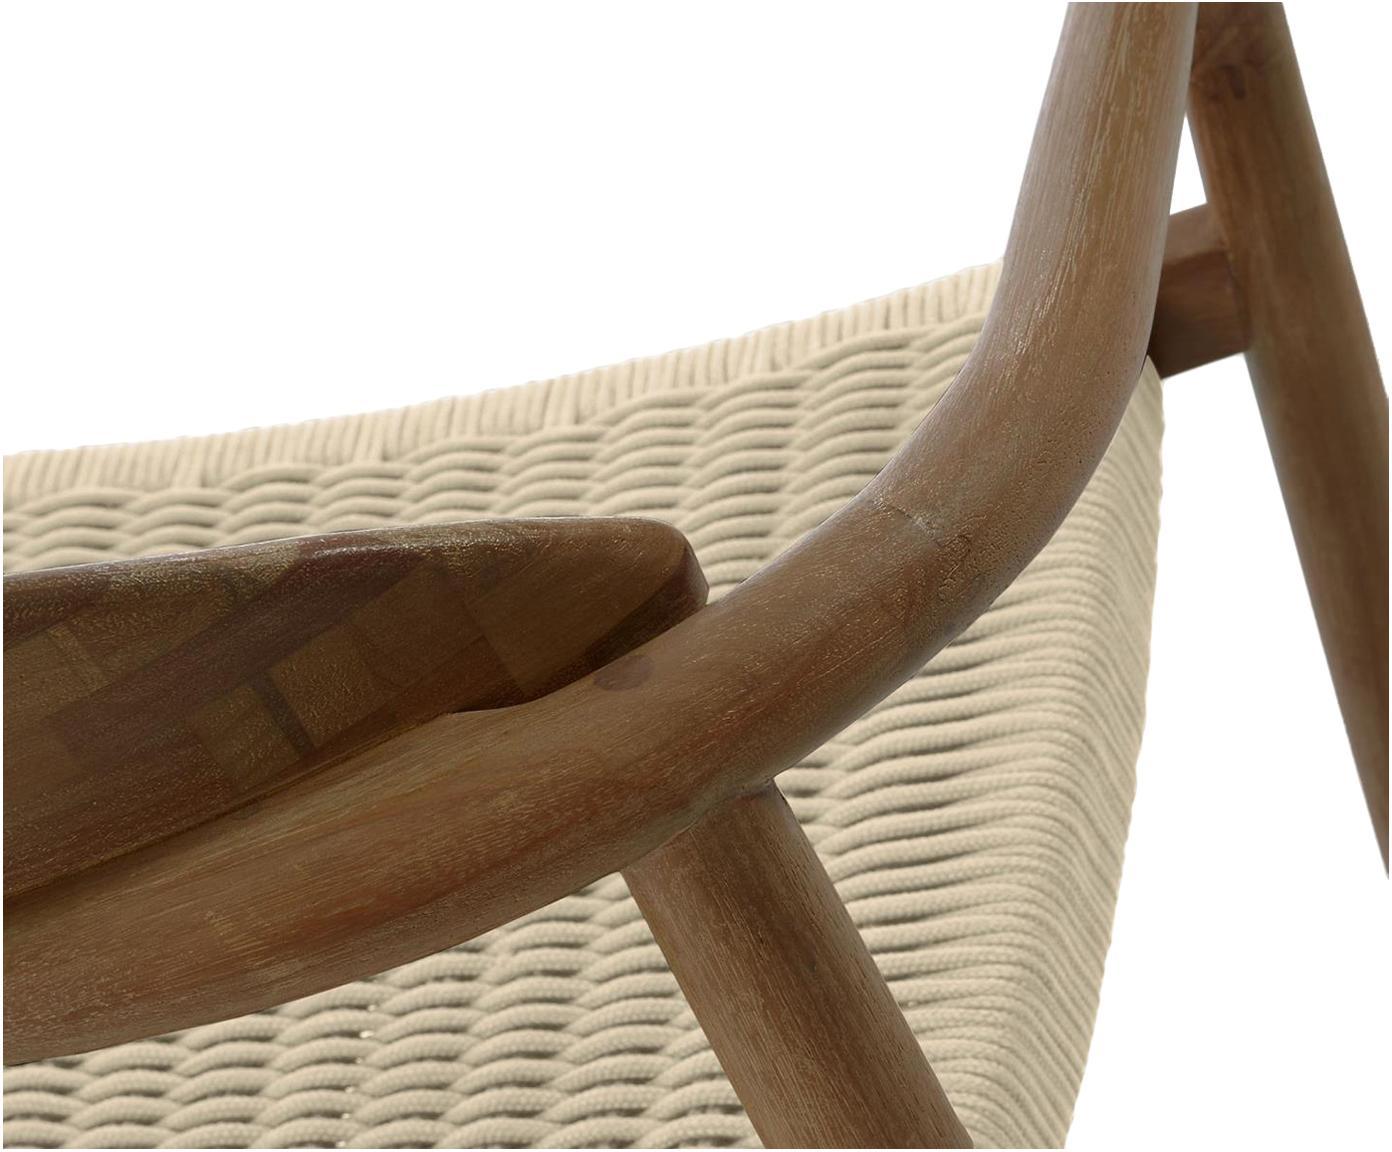 Armstoel Nina van massief hout, Frame: massief eucalyptushout, Zitvlak: polyester, UV-bestendig, Beige, bruin, B 56 x D 53 cm